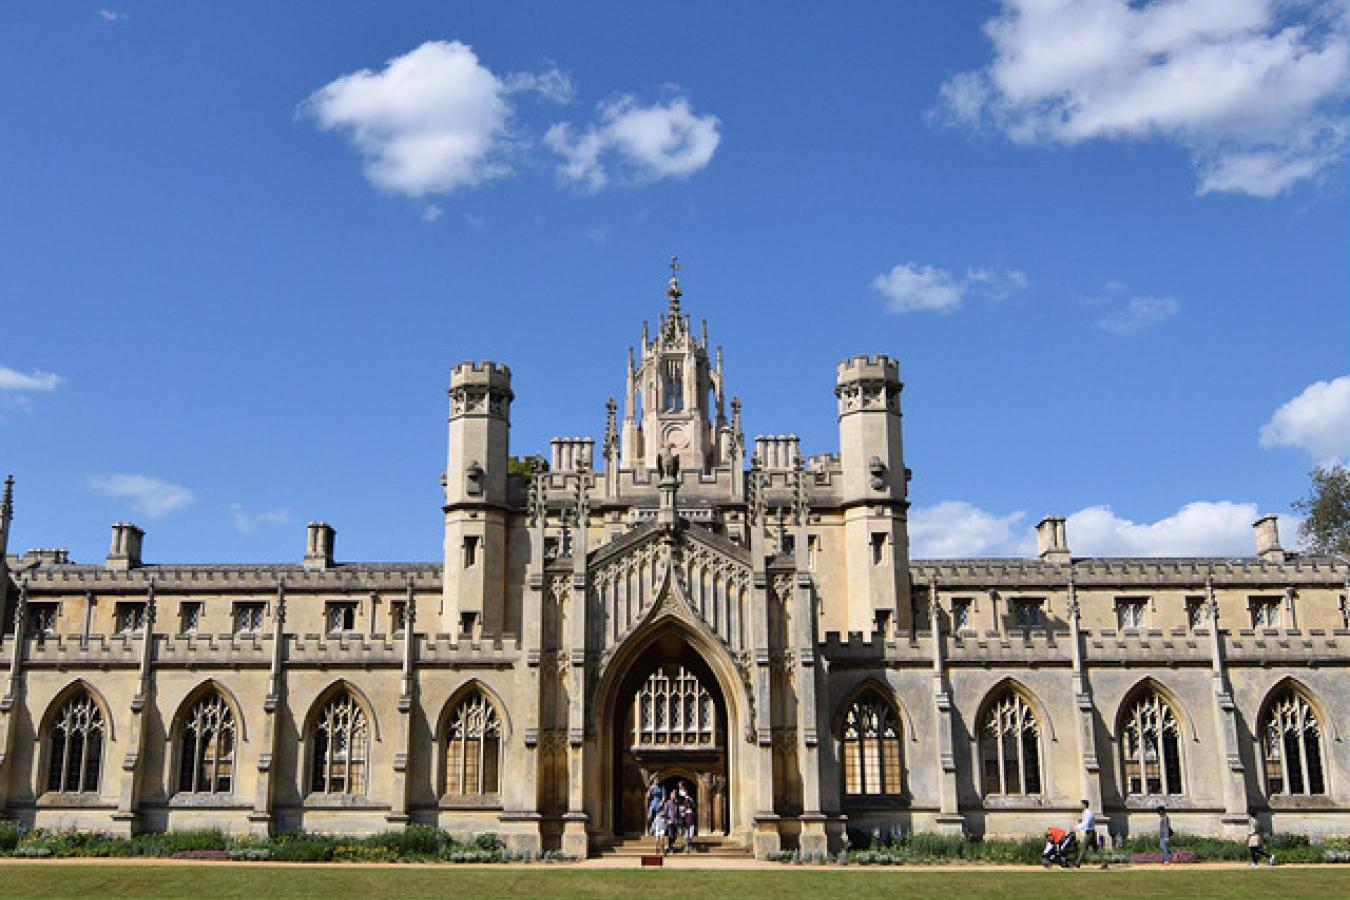 Cambridge Unversity Summer 2015